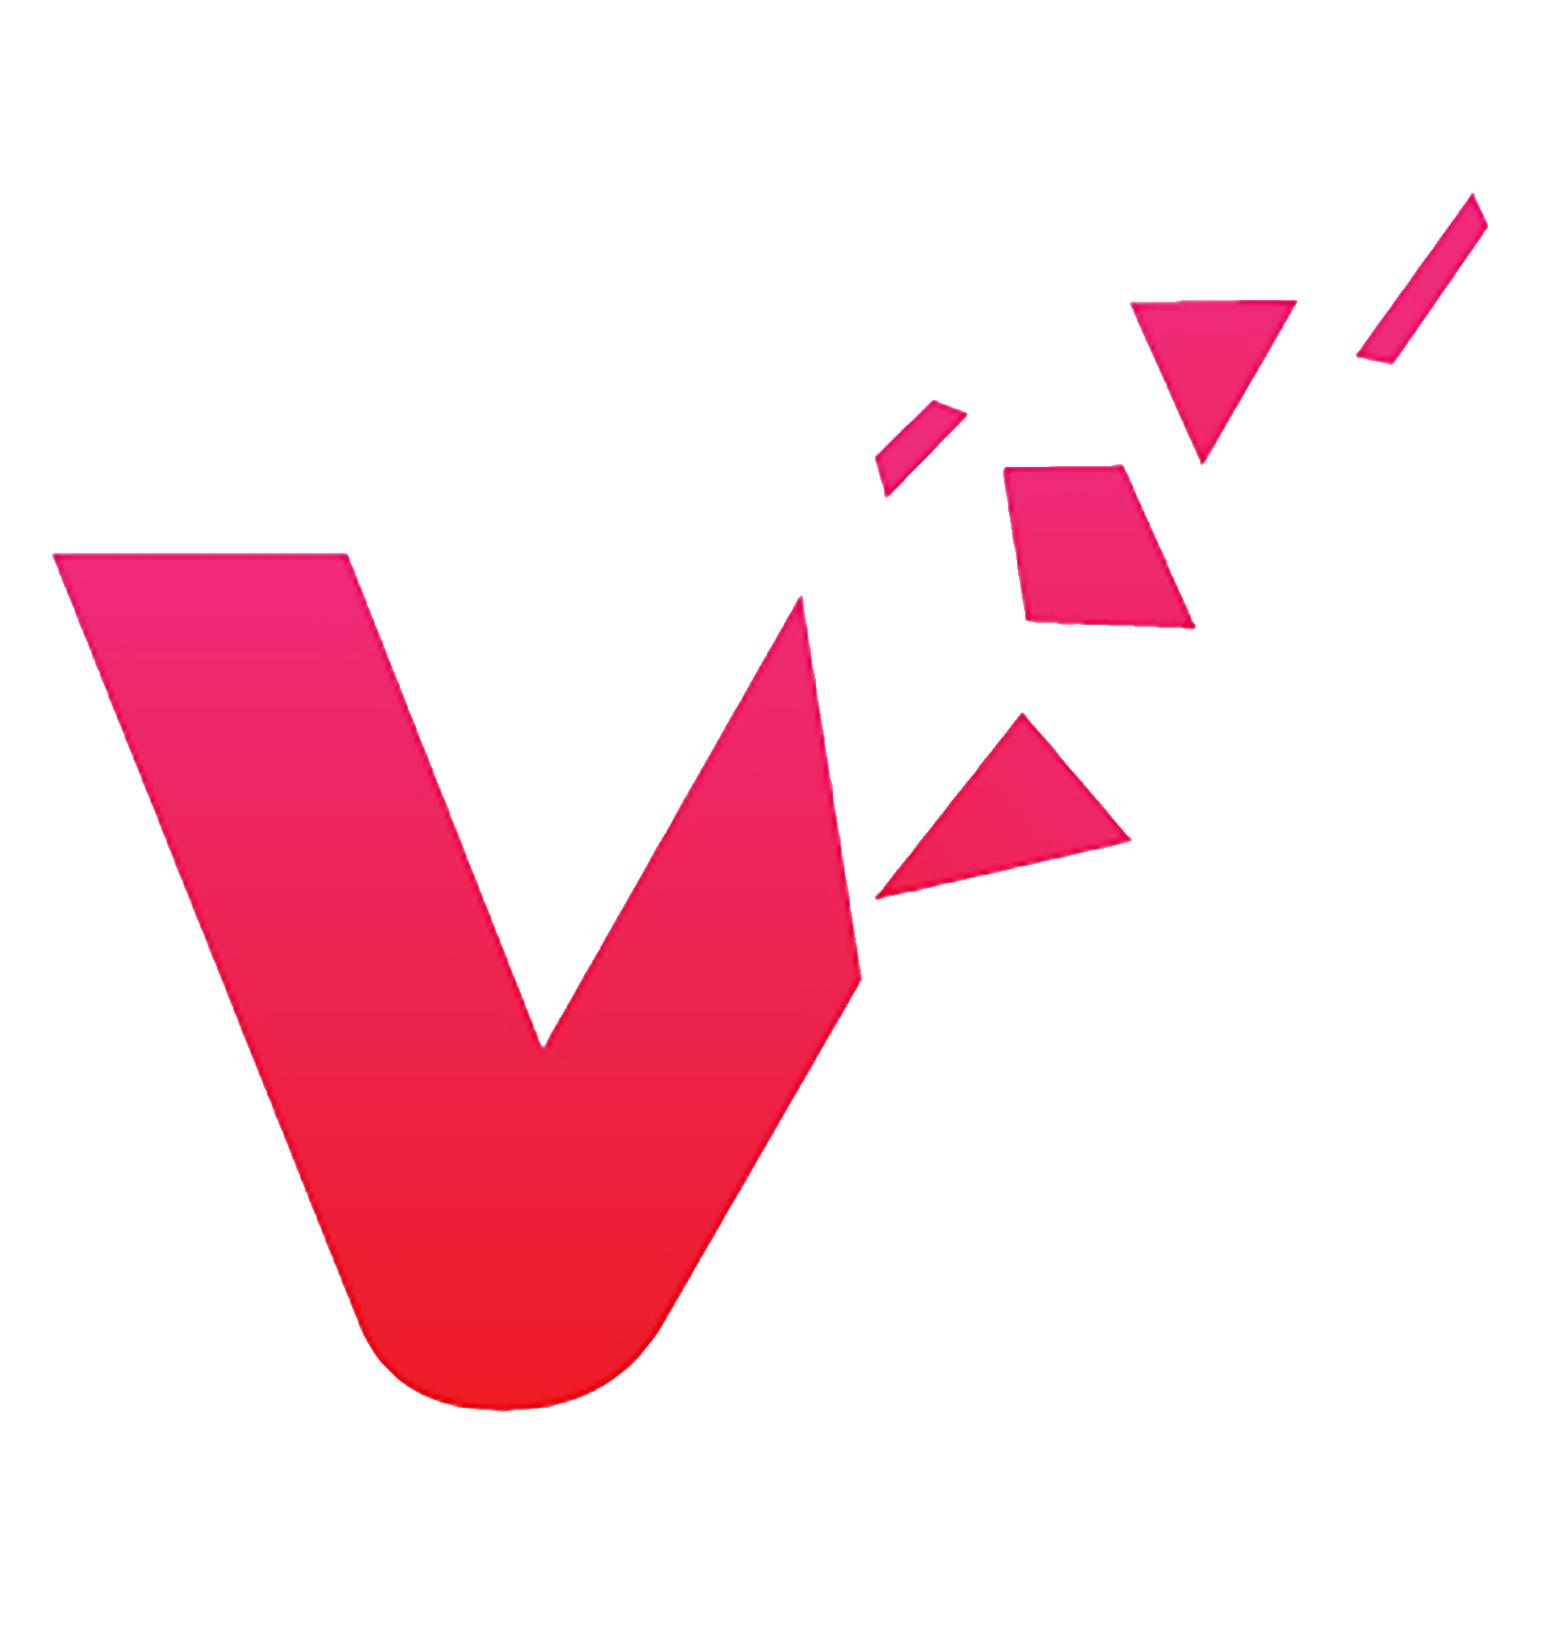 VFX Studio in India, VFX Company in India, Animation Company.